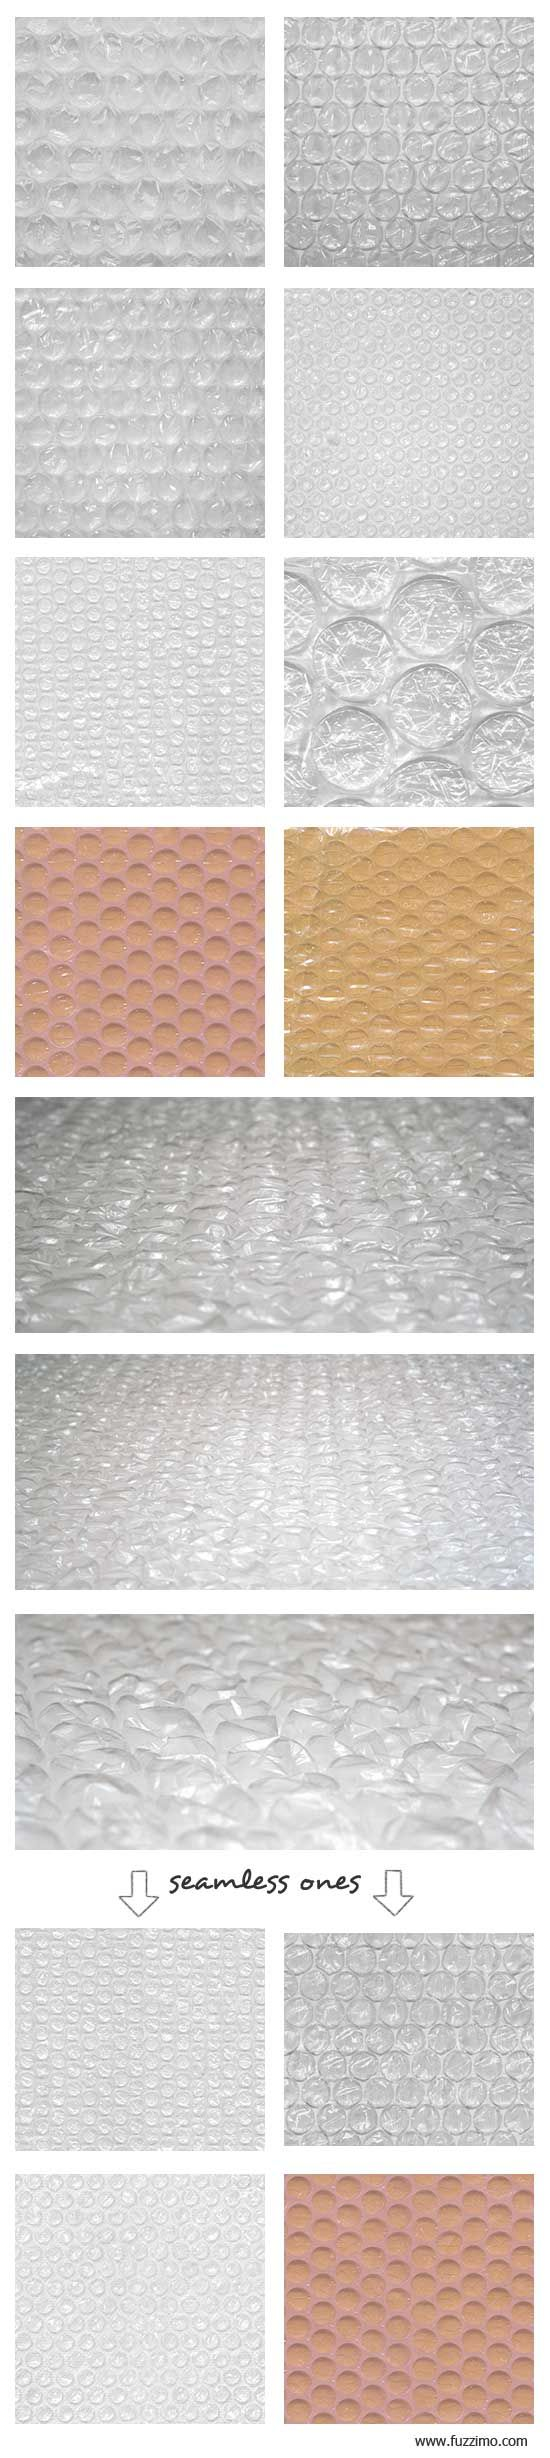 Free Hi-Res Bubble Wrap Textures